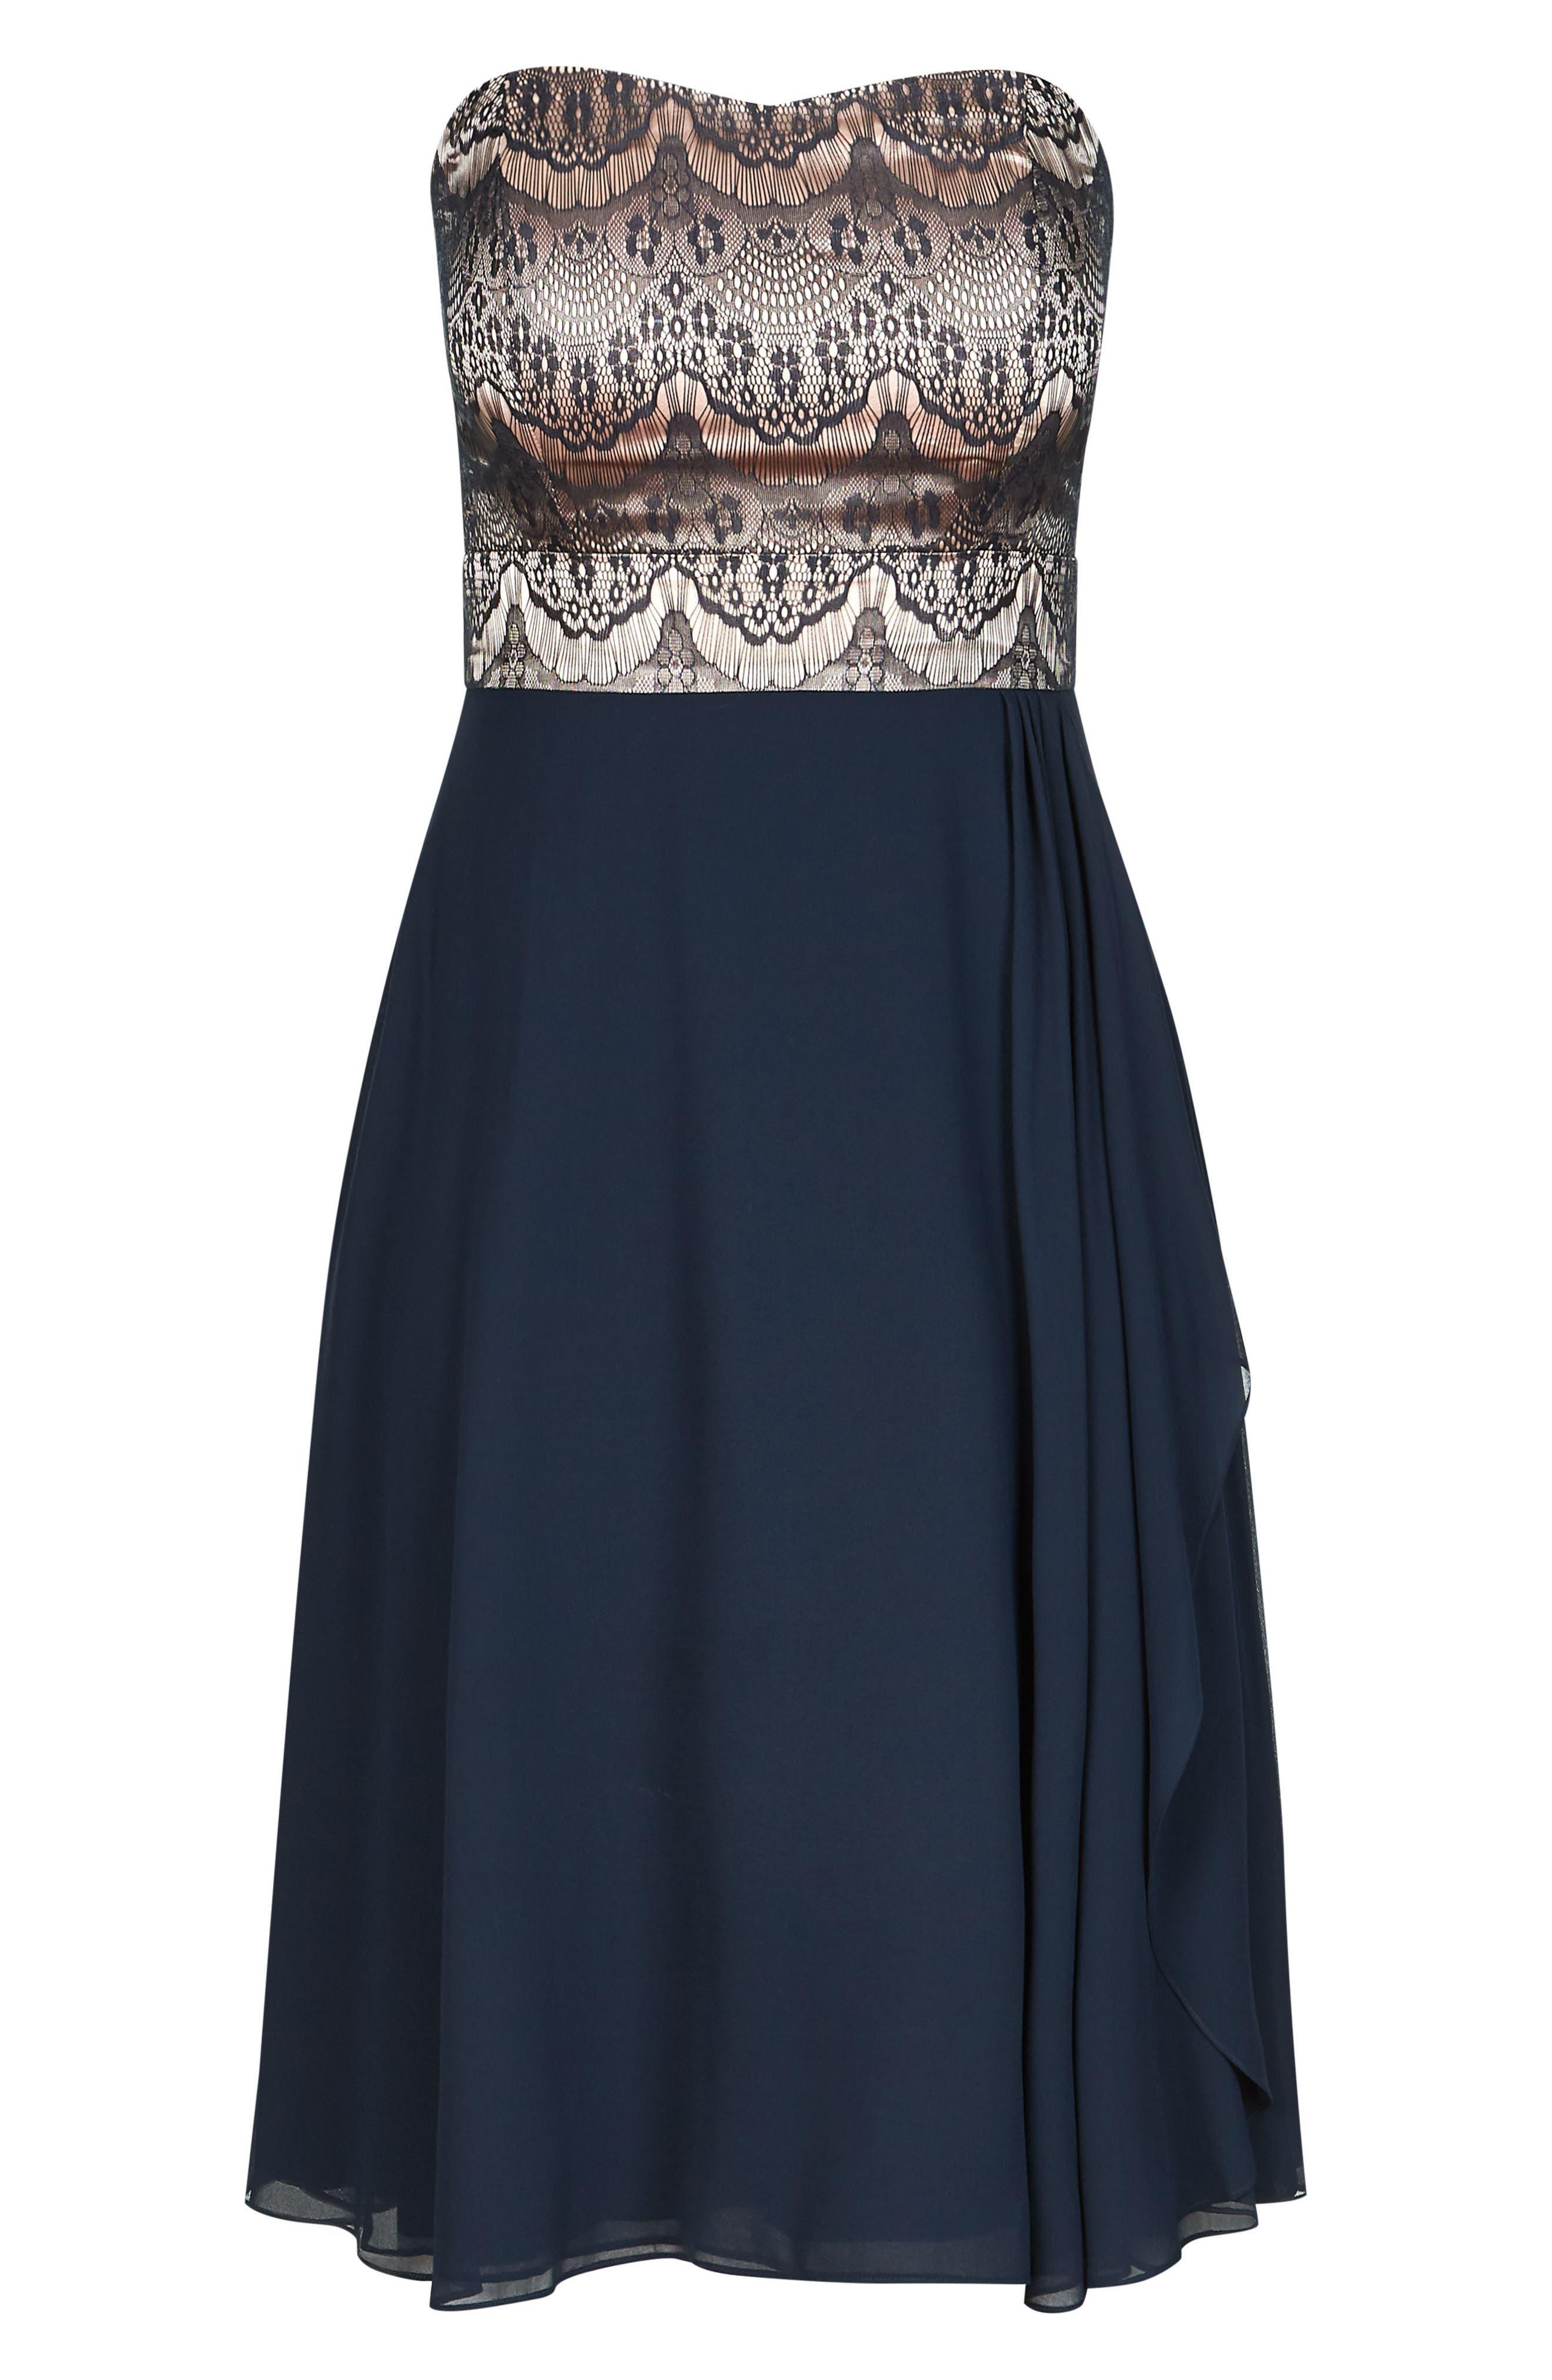 Eyelash Ebony Strapless Fit & Flare Dress,                             Alternate thumbnail 3, color,                             NAVY